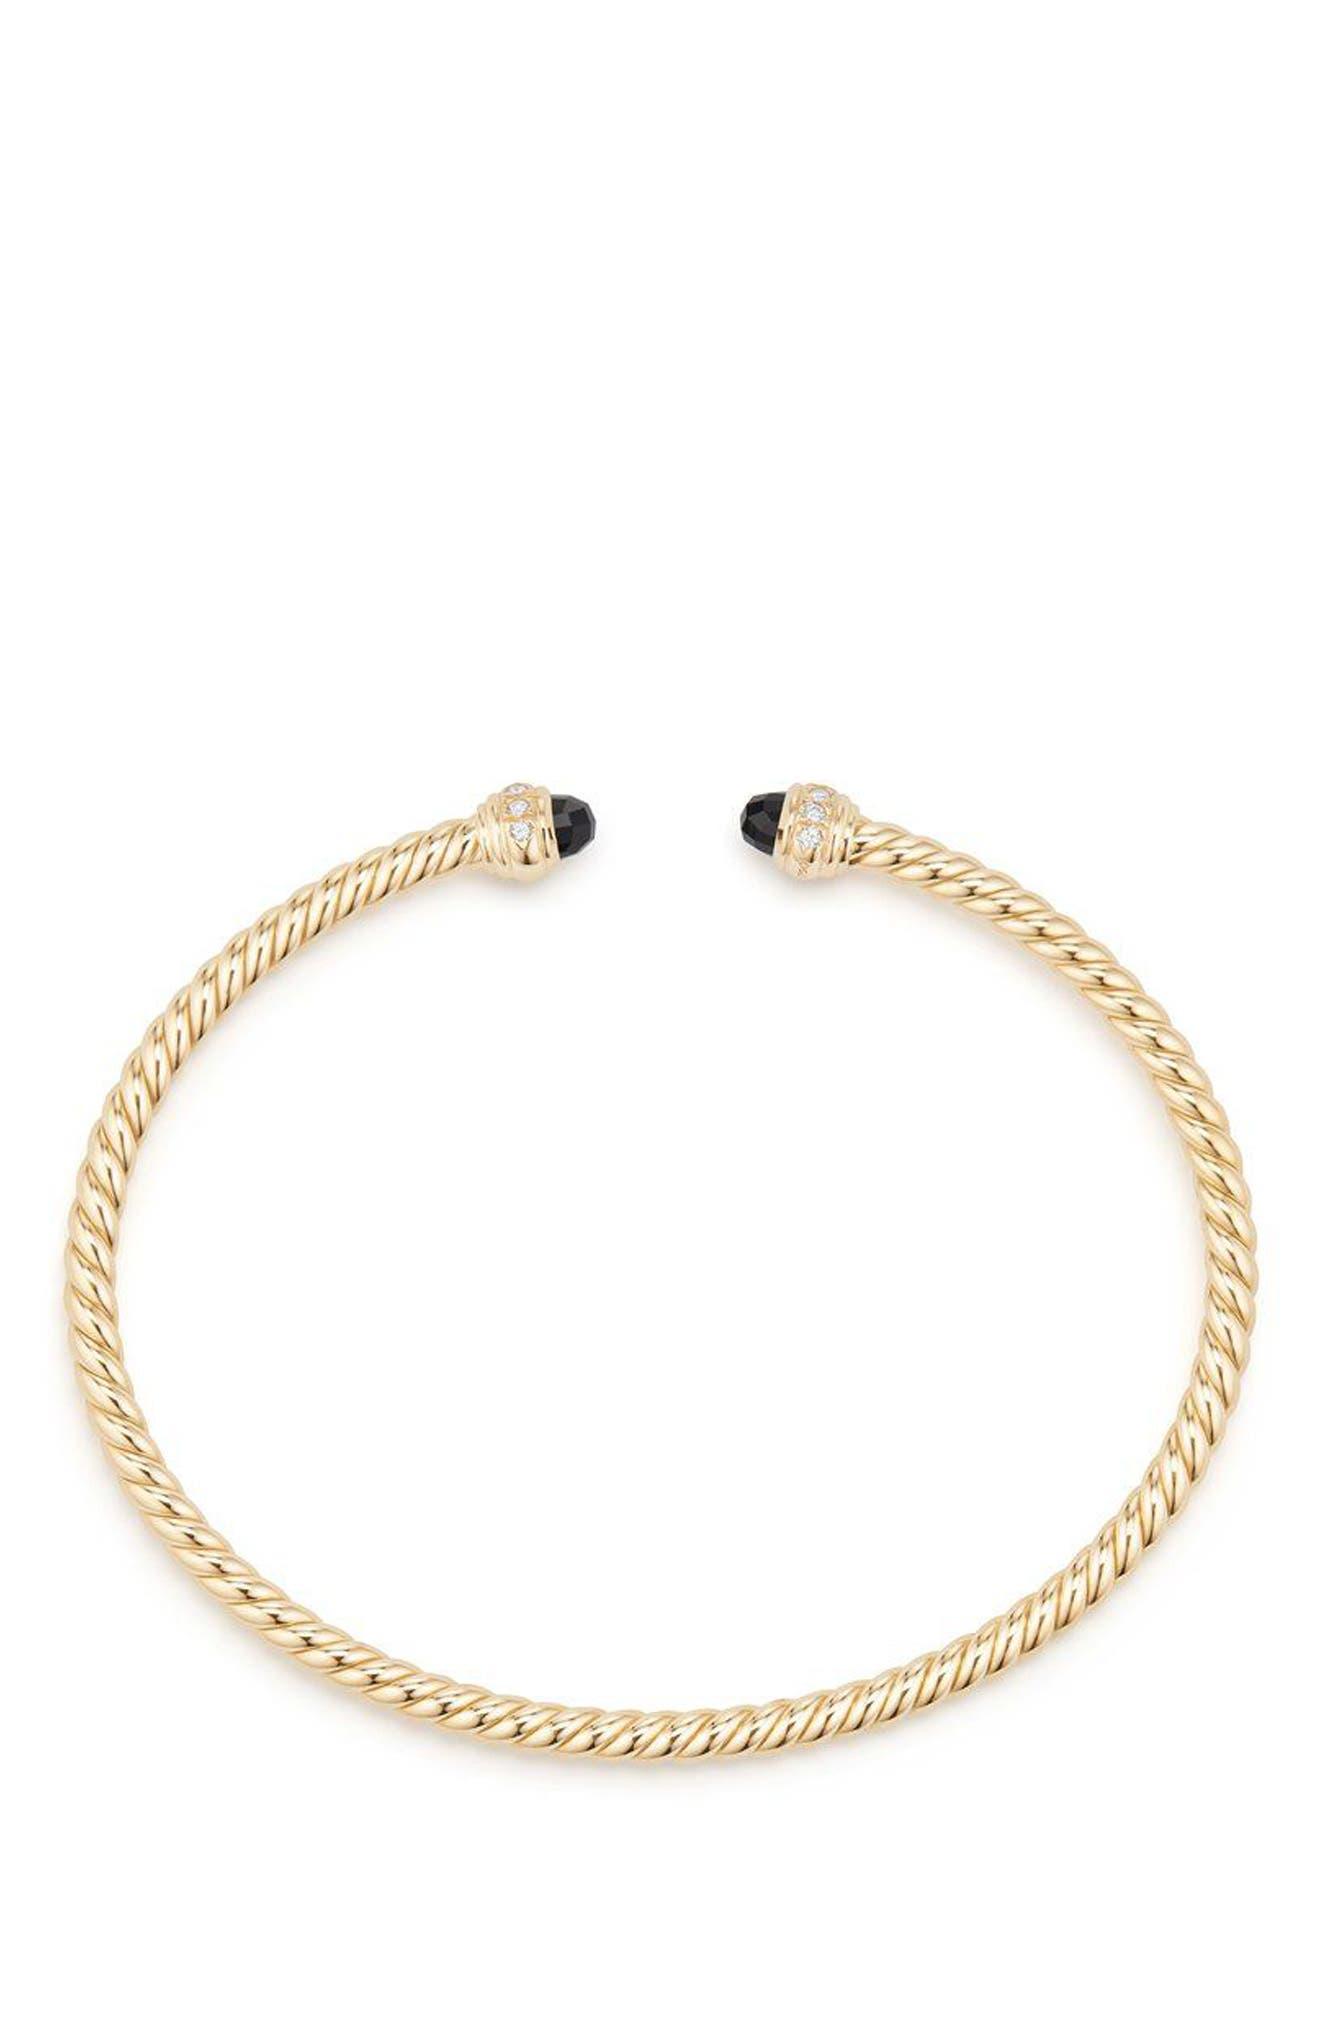 Cable Spira Bracelet in 18K Gold with Diamonds, 3mm,                             Alternate thumbnail 2, color,                             GOLD/ DIAMOND/ BLACK ONYX